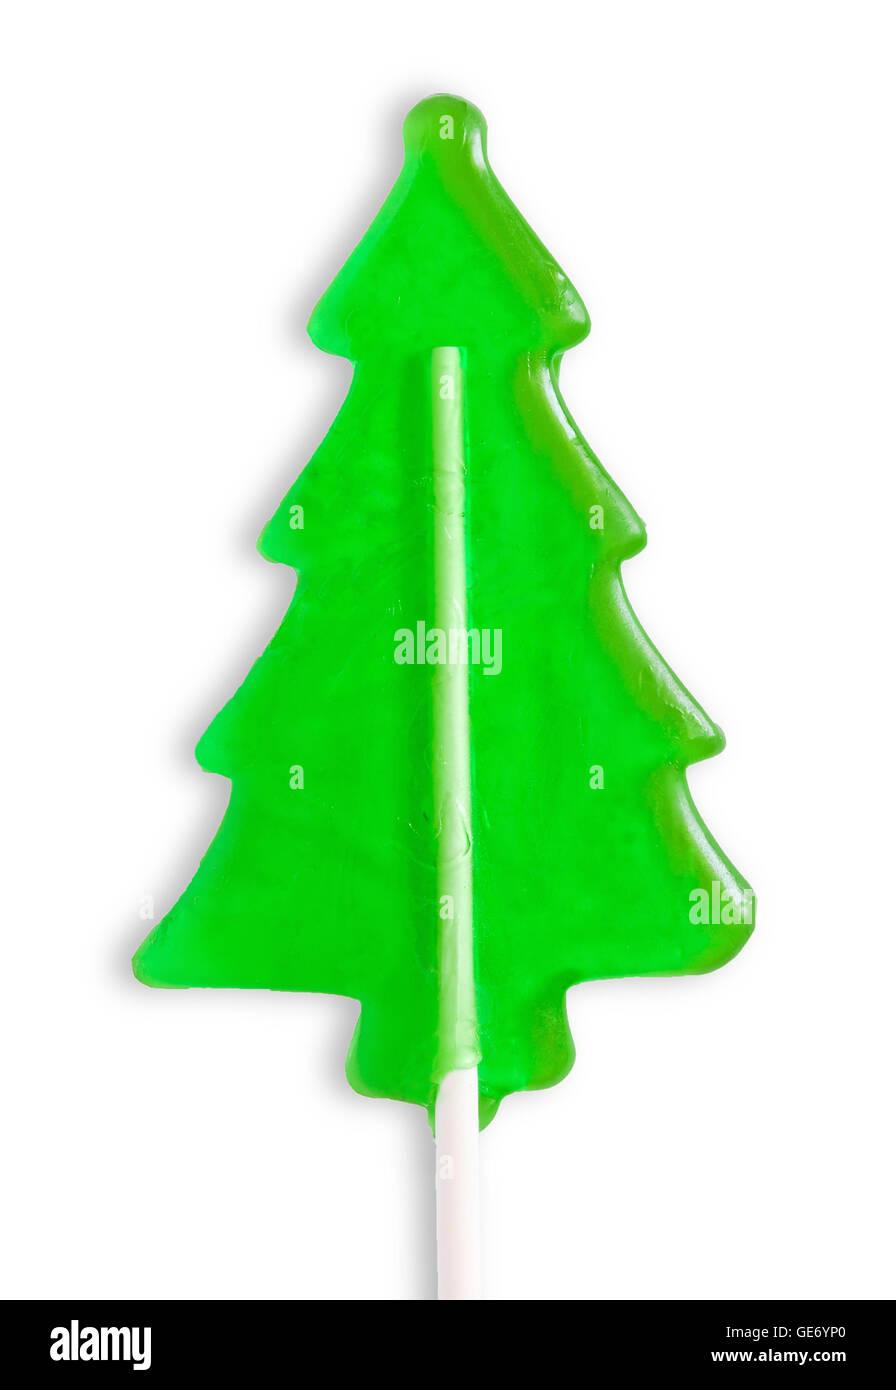 Green Lollipop Stock Photos & Green Lollipop Stock Images - Alamy